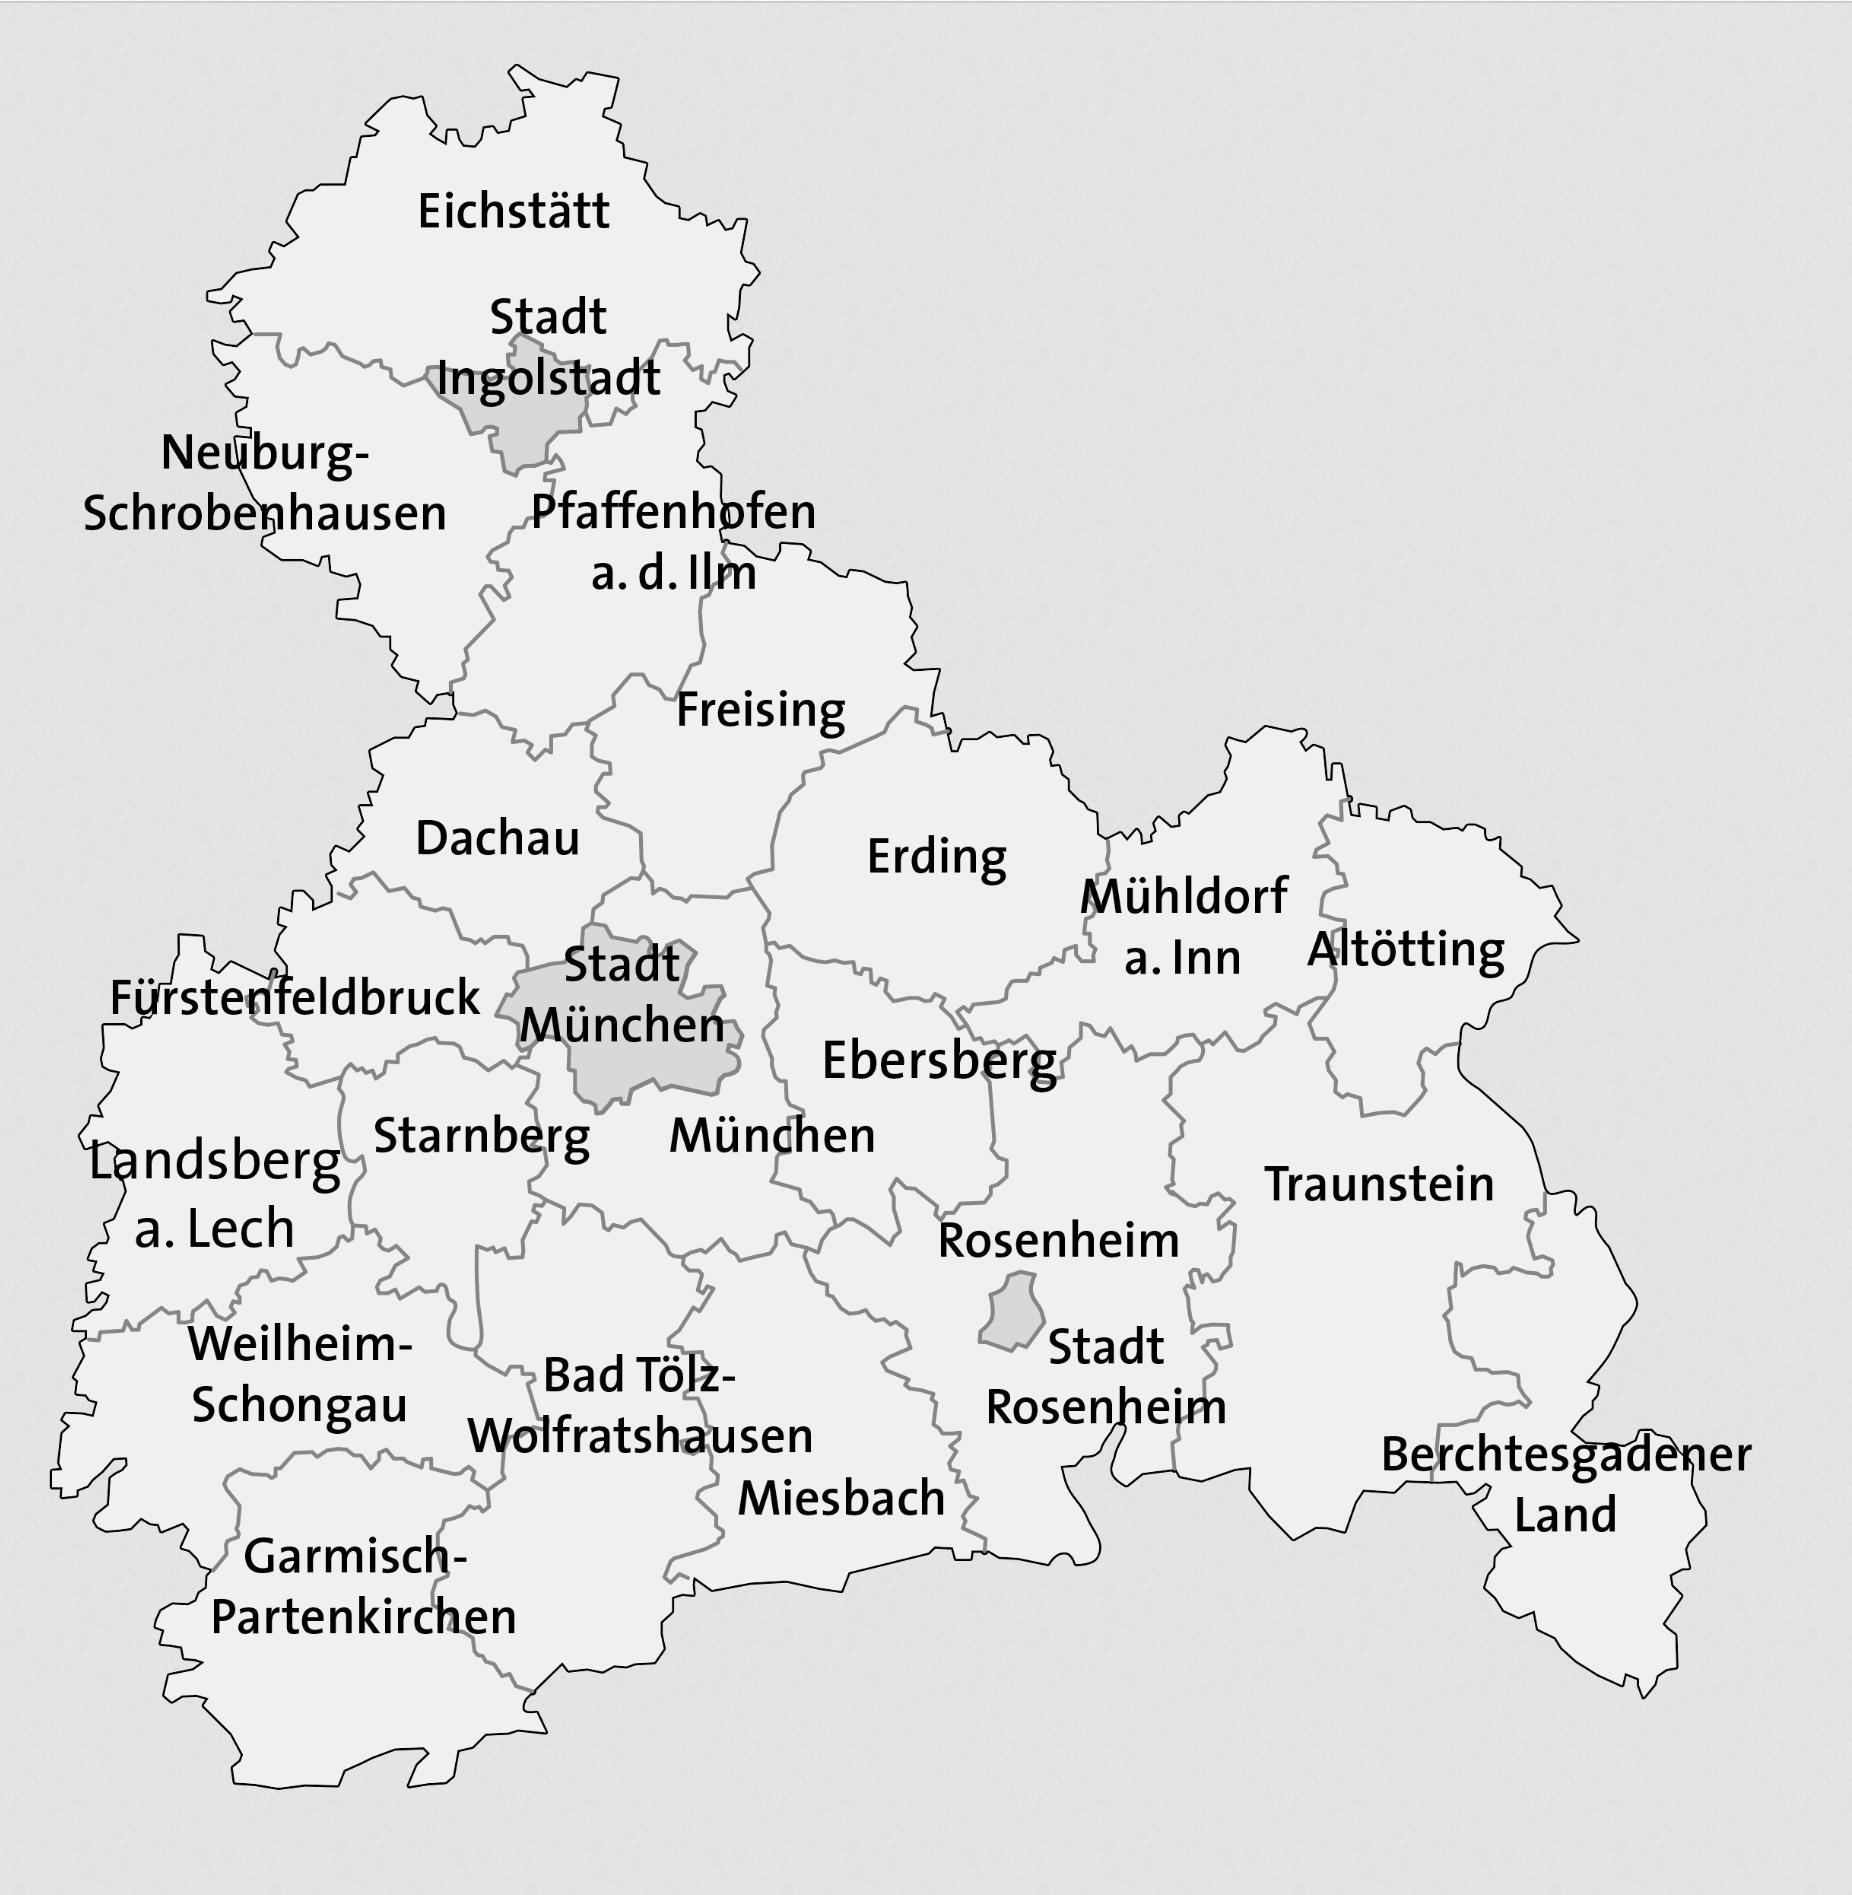 Karte Oberbayern Landkreise.Oberbayern Bezirk Oberbayern